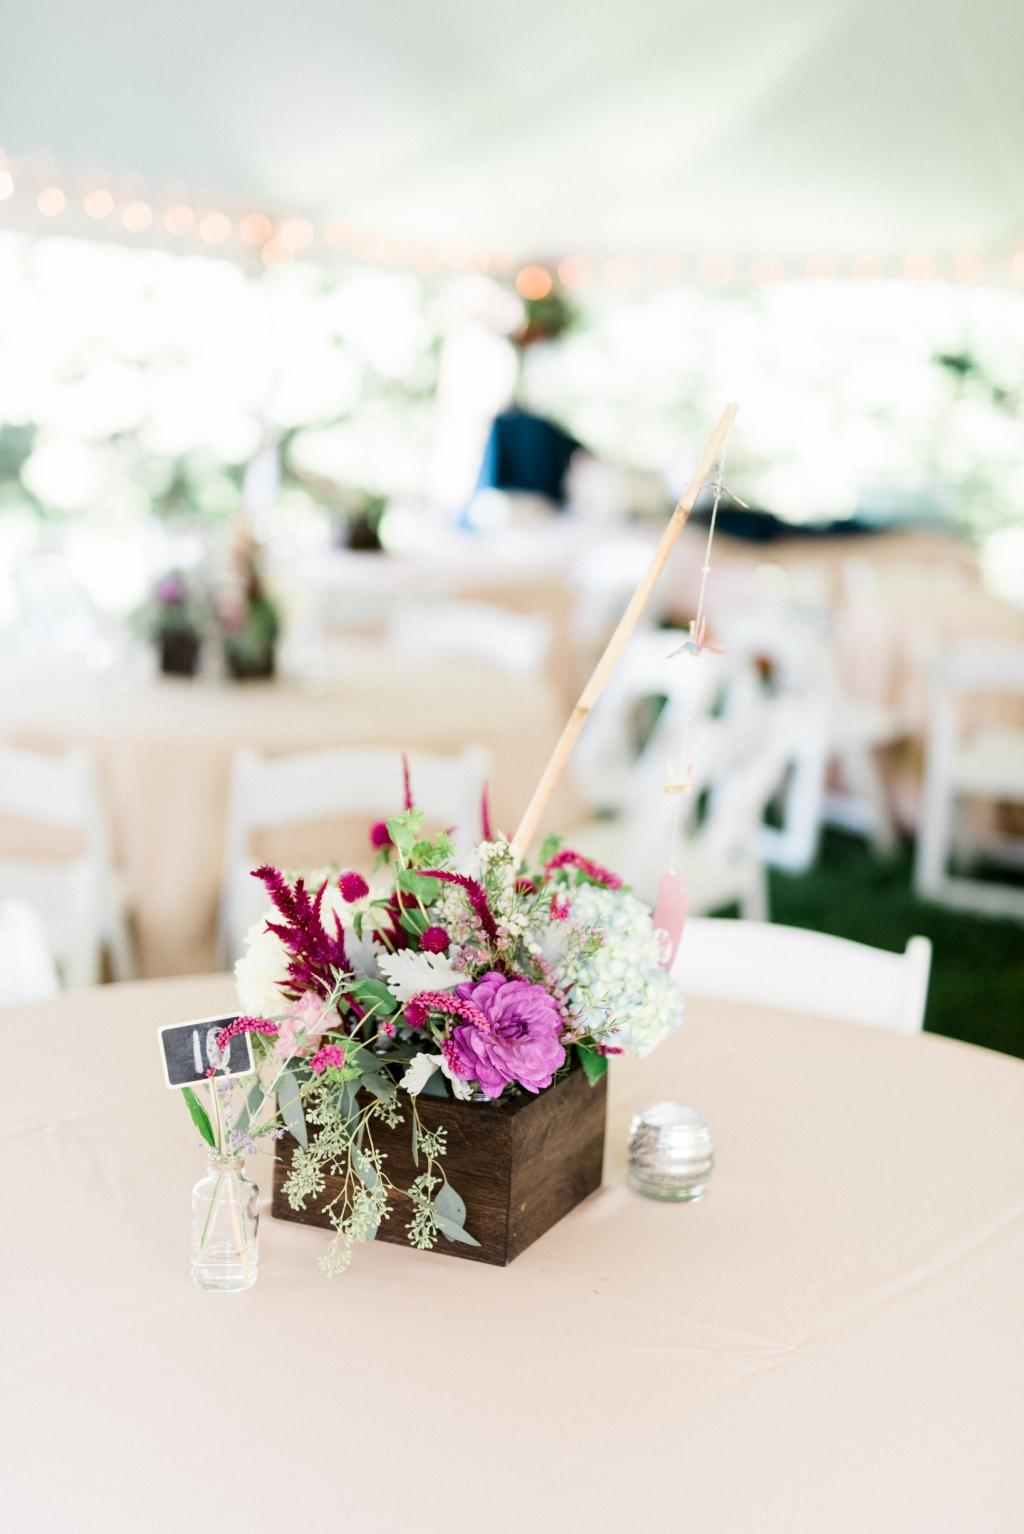 haley-richter-photography-buena-vista-confrence-center-wedding-summer-108